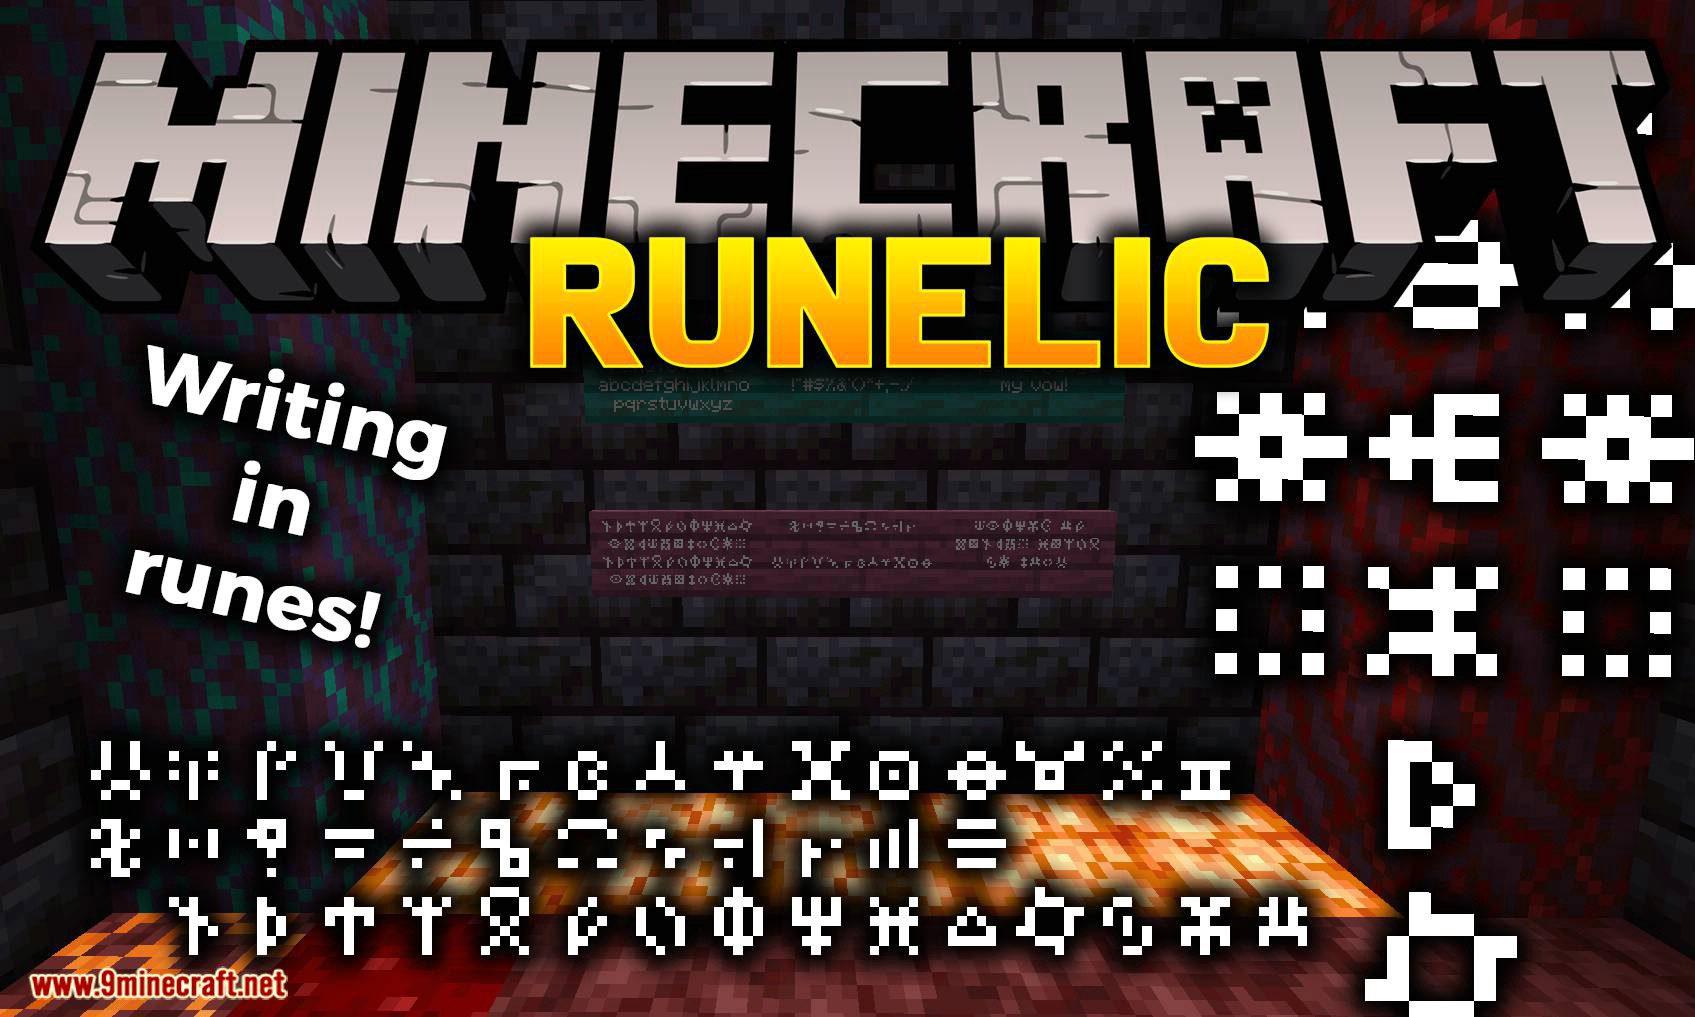 Runelic mod for minecraft logo